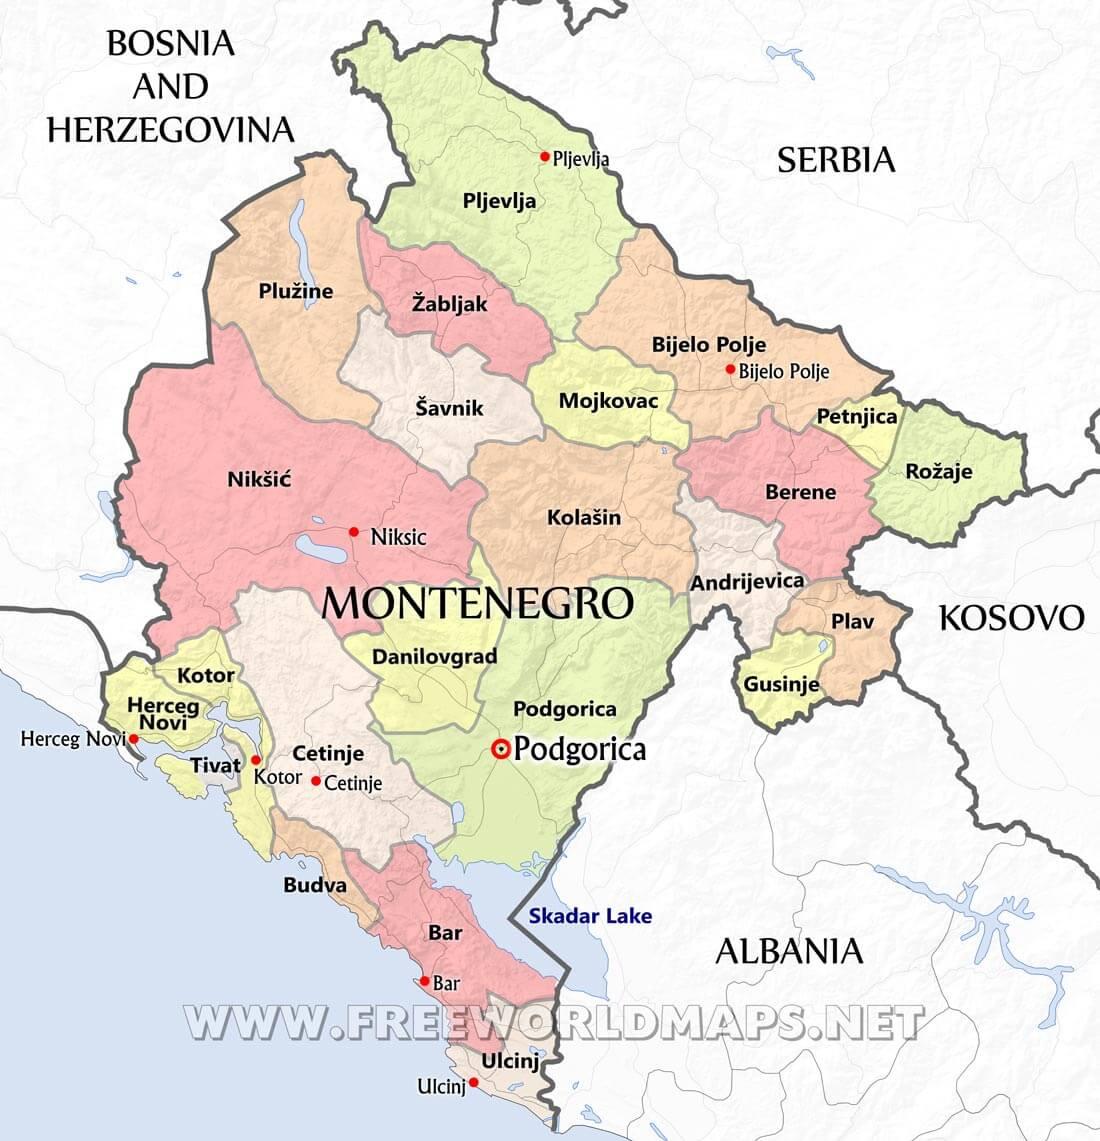 Europe Map Montenegro Montenegro Maps   by Freeworldmaps.net